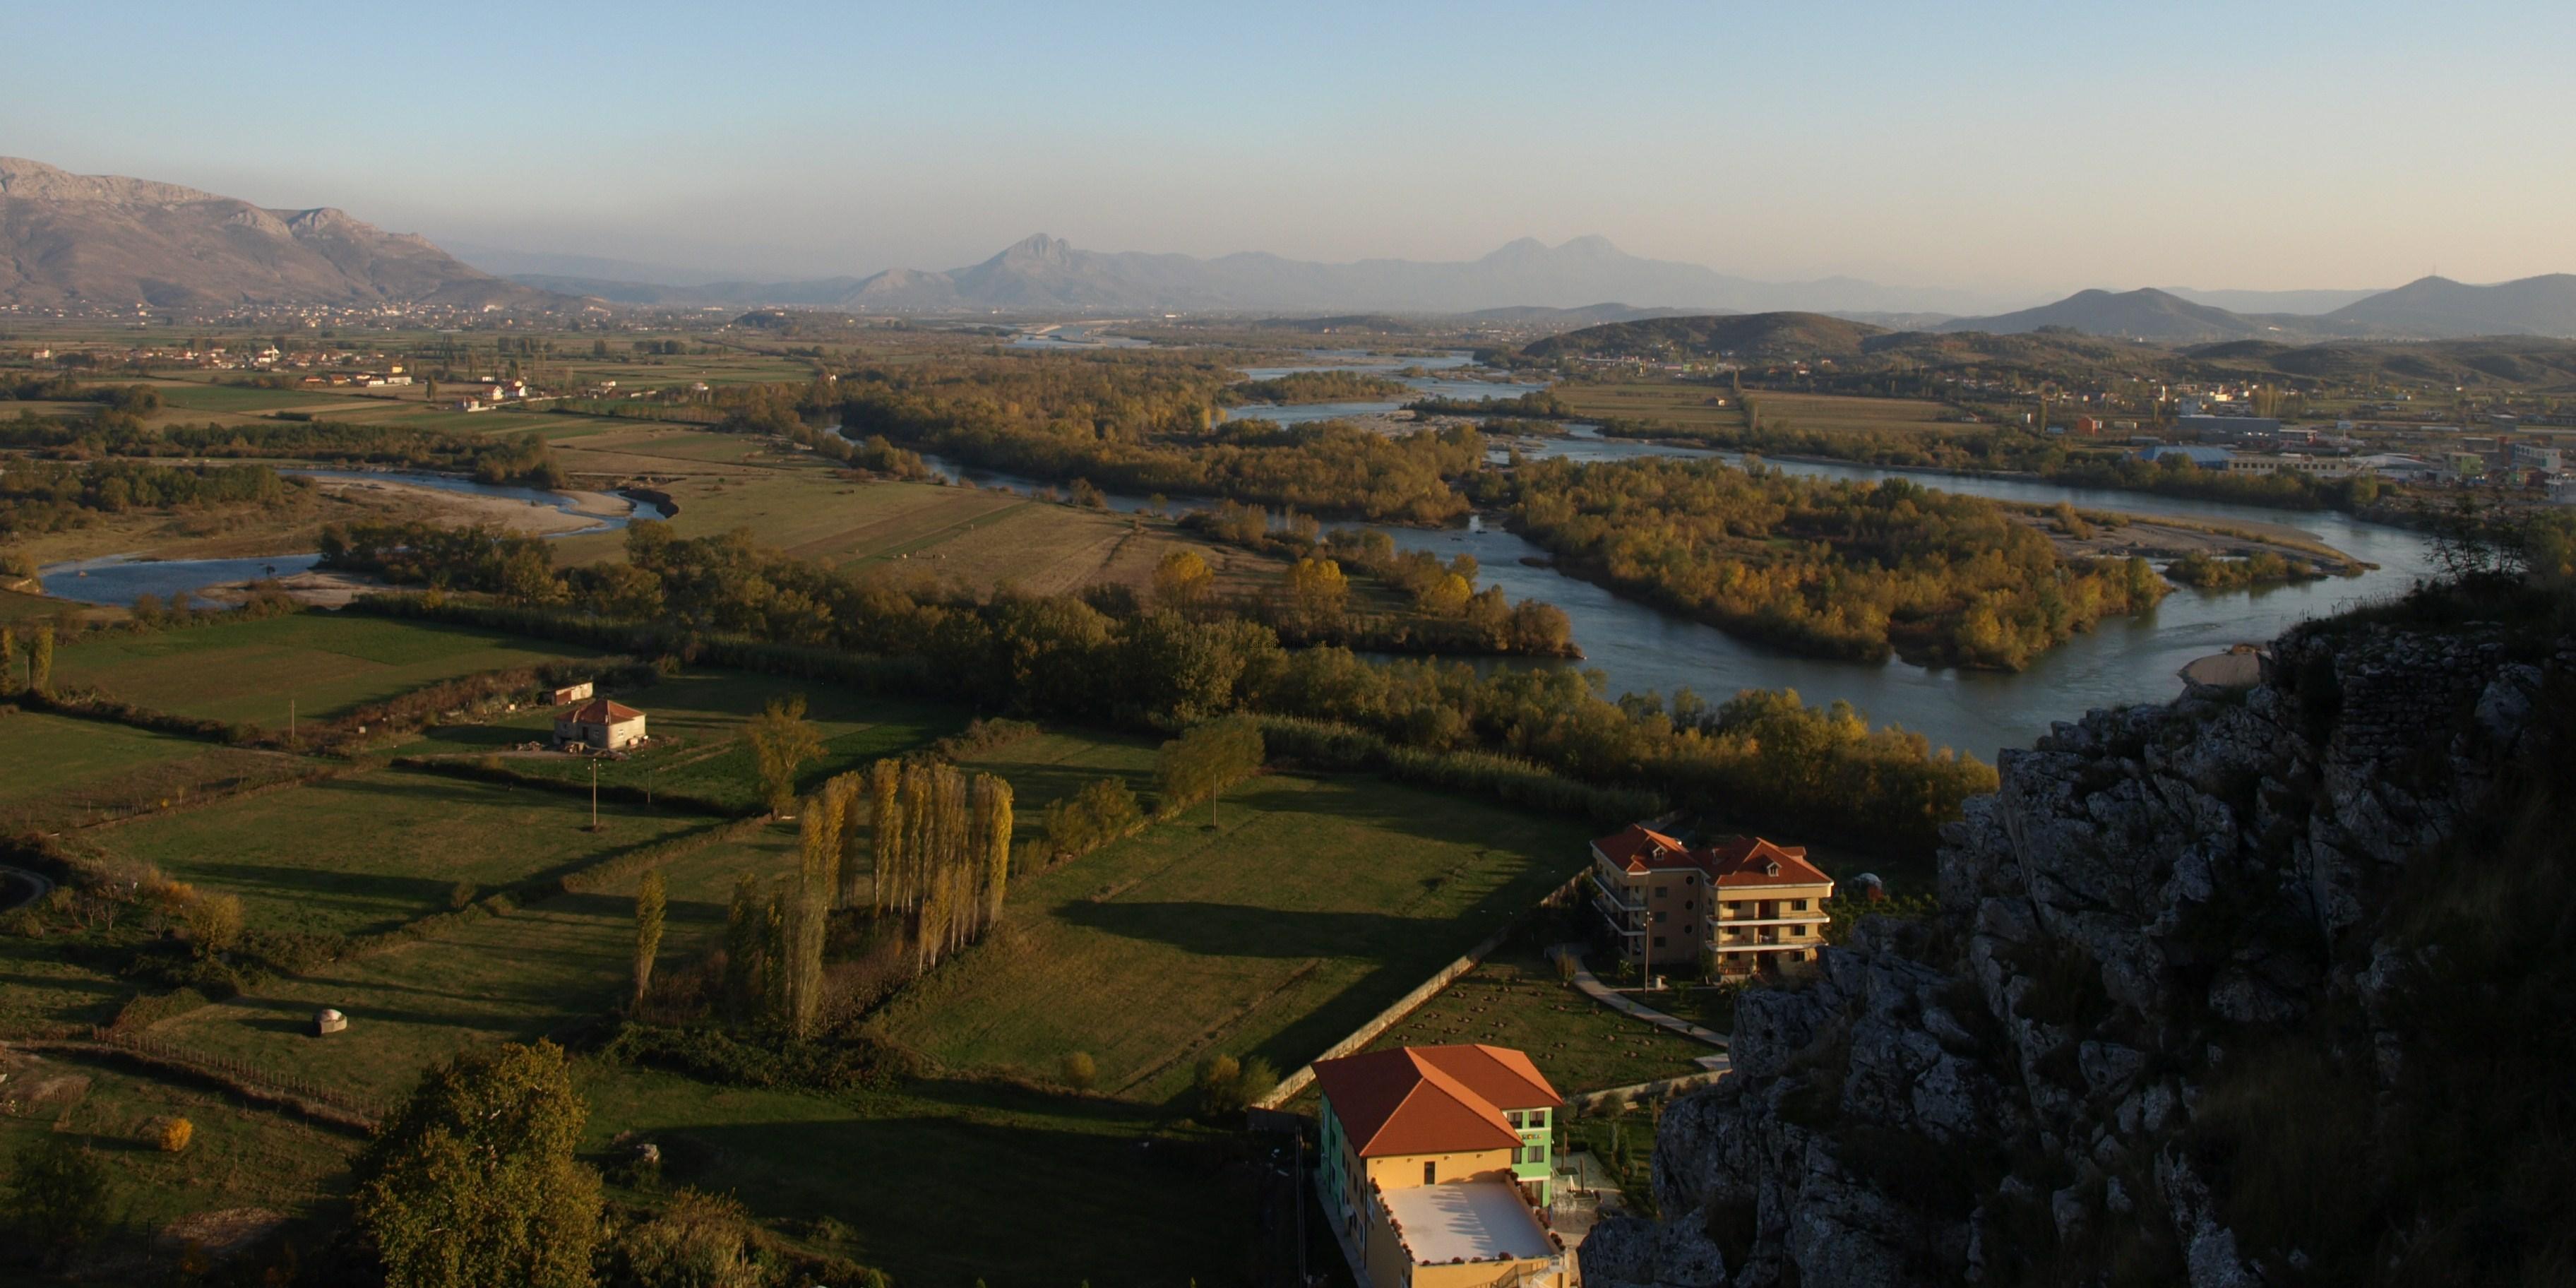 View from Rozafa Castle, Shkoder